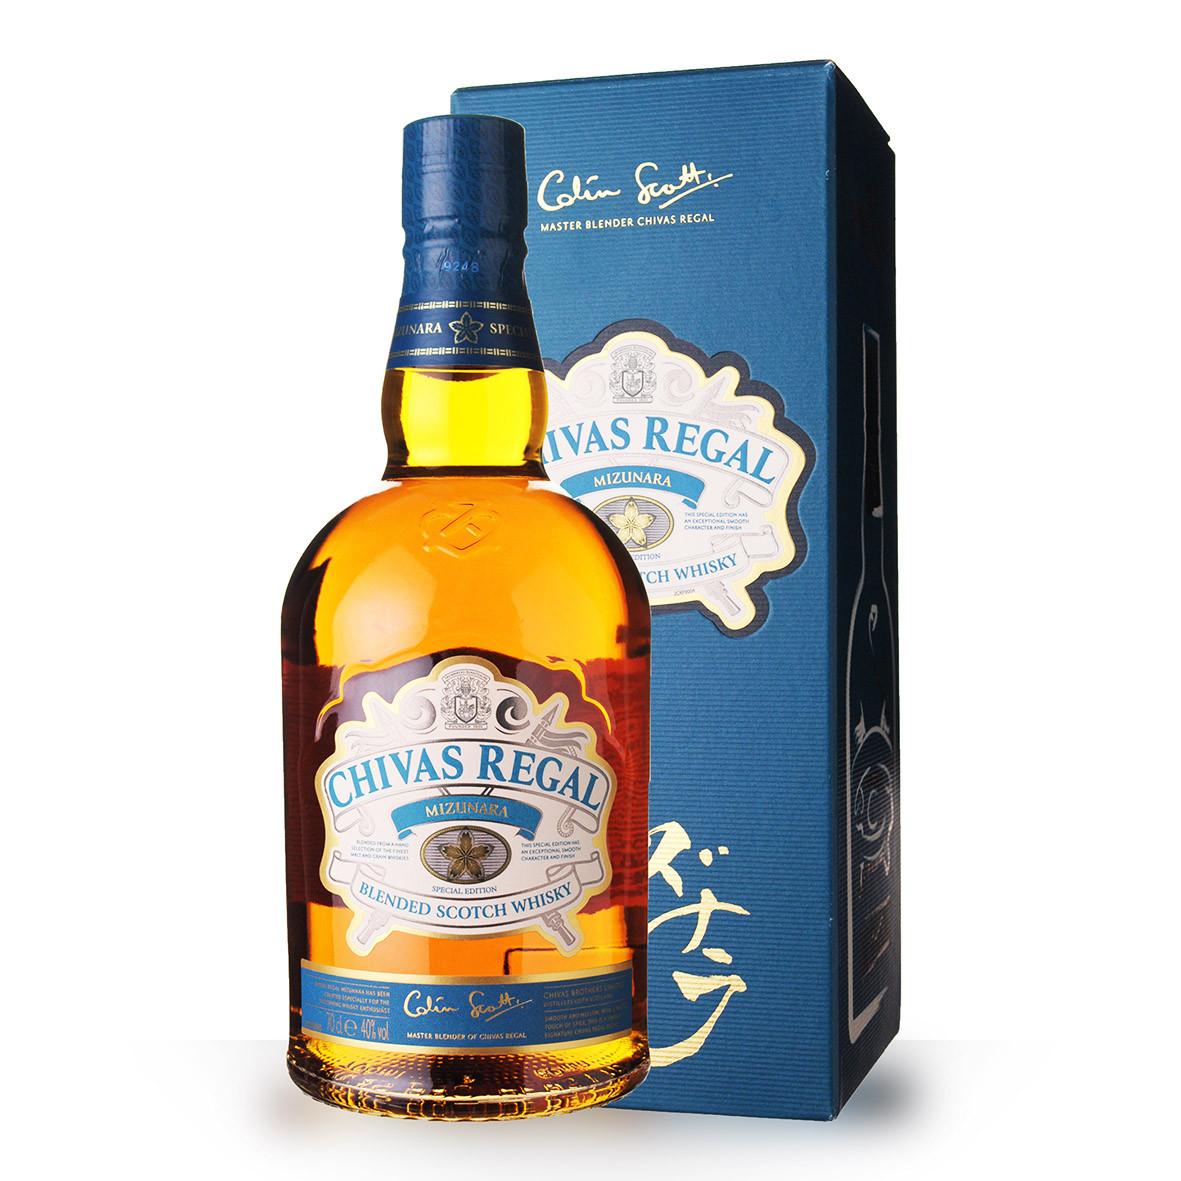 Whisky Chivas Regal Mizunara 70cl Coffret www.odyssee-vins.com